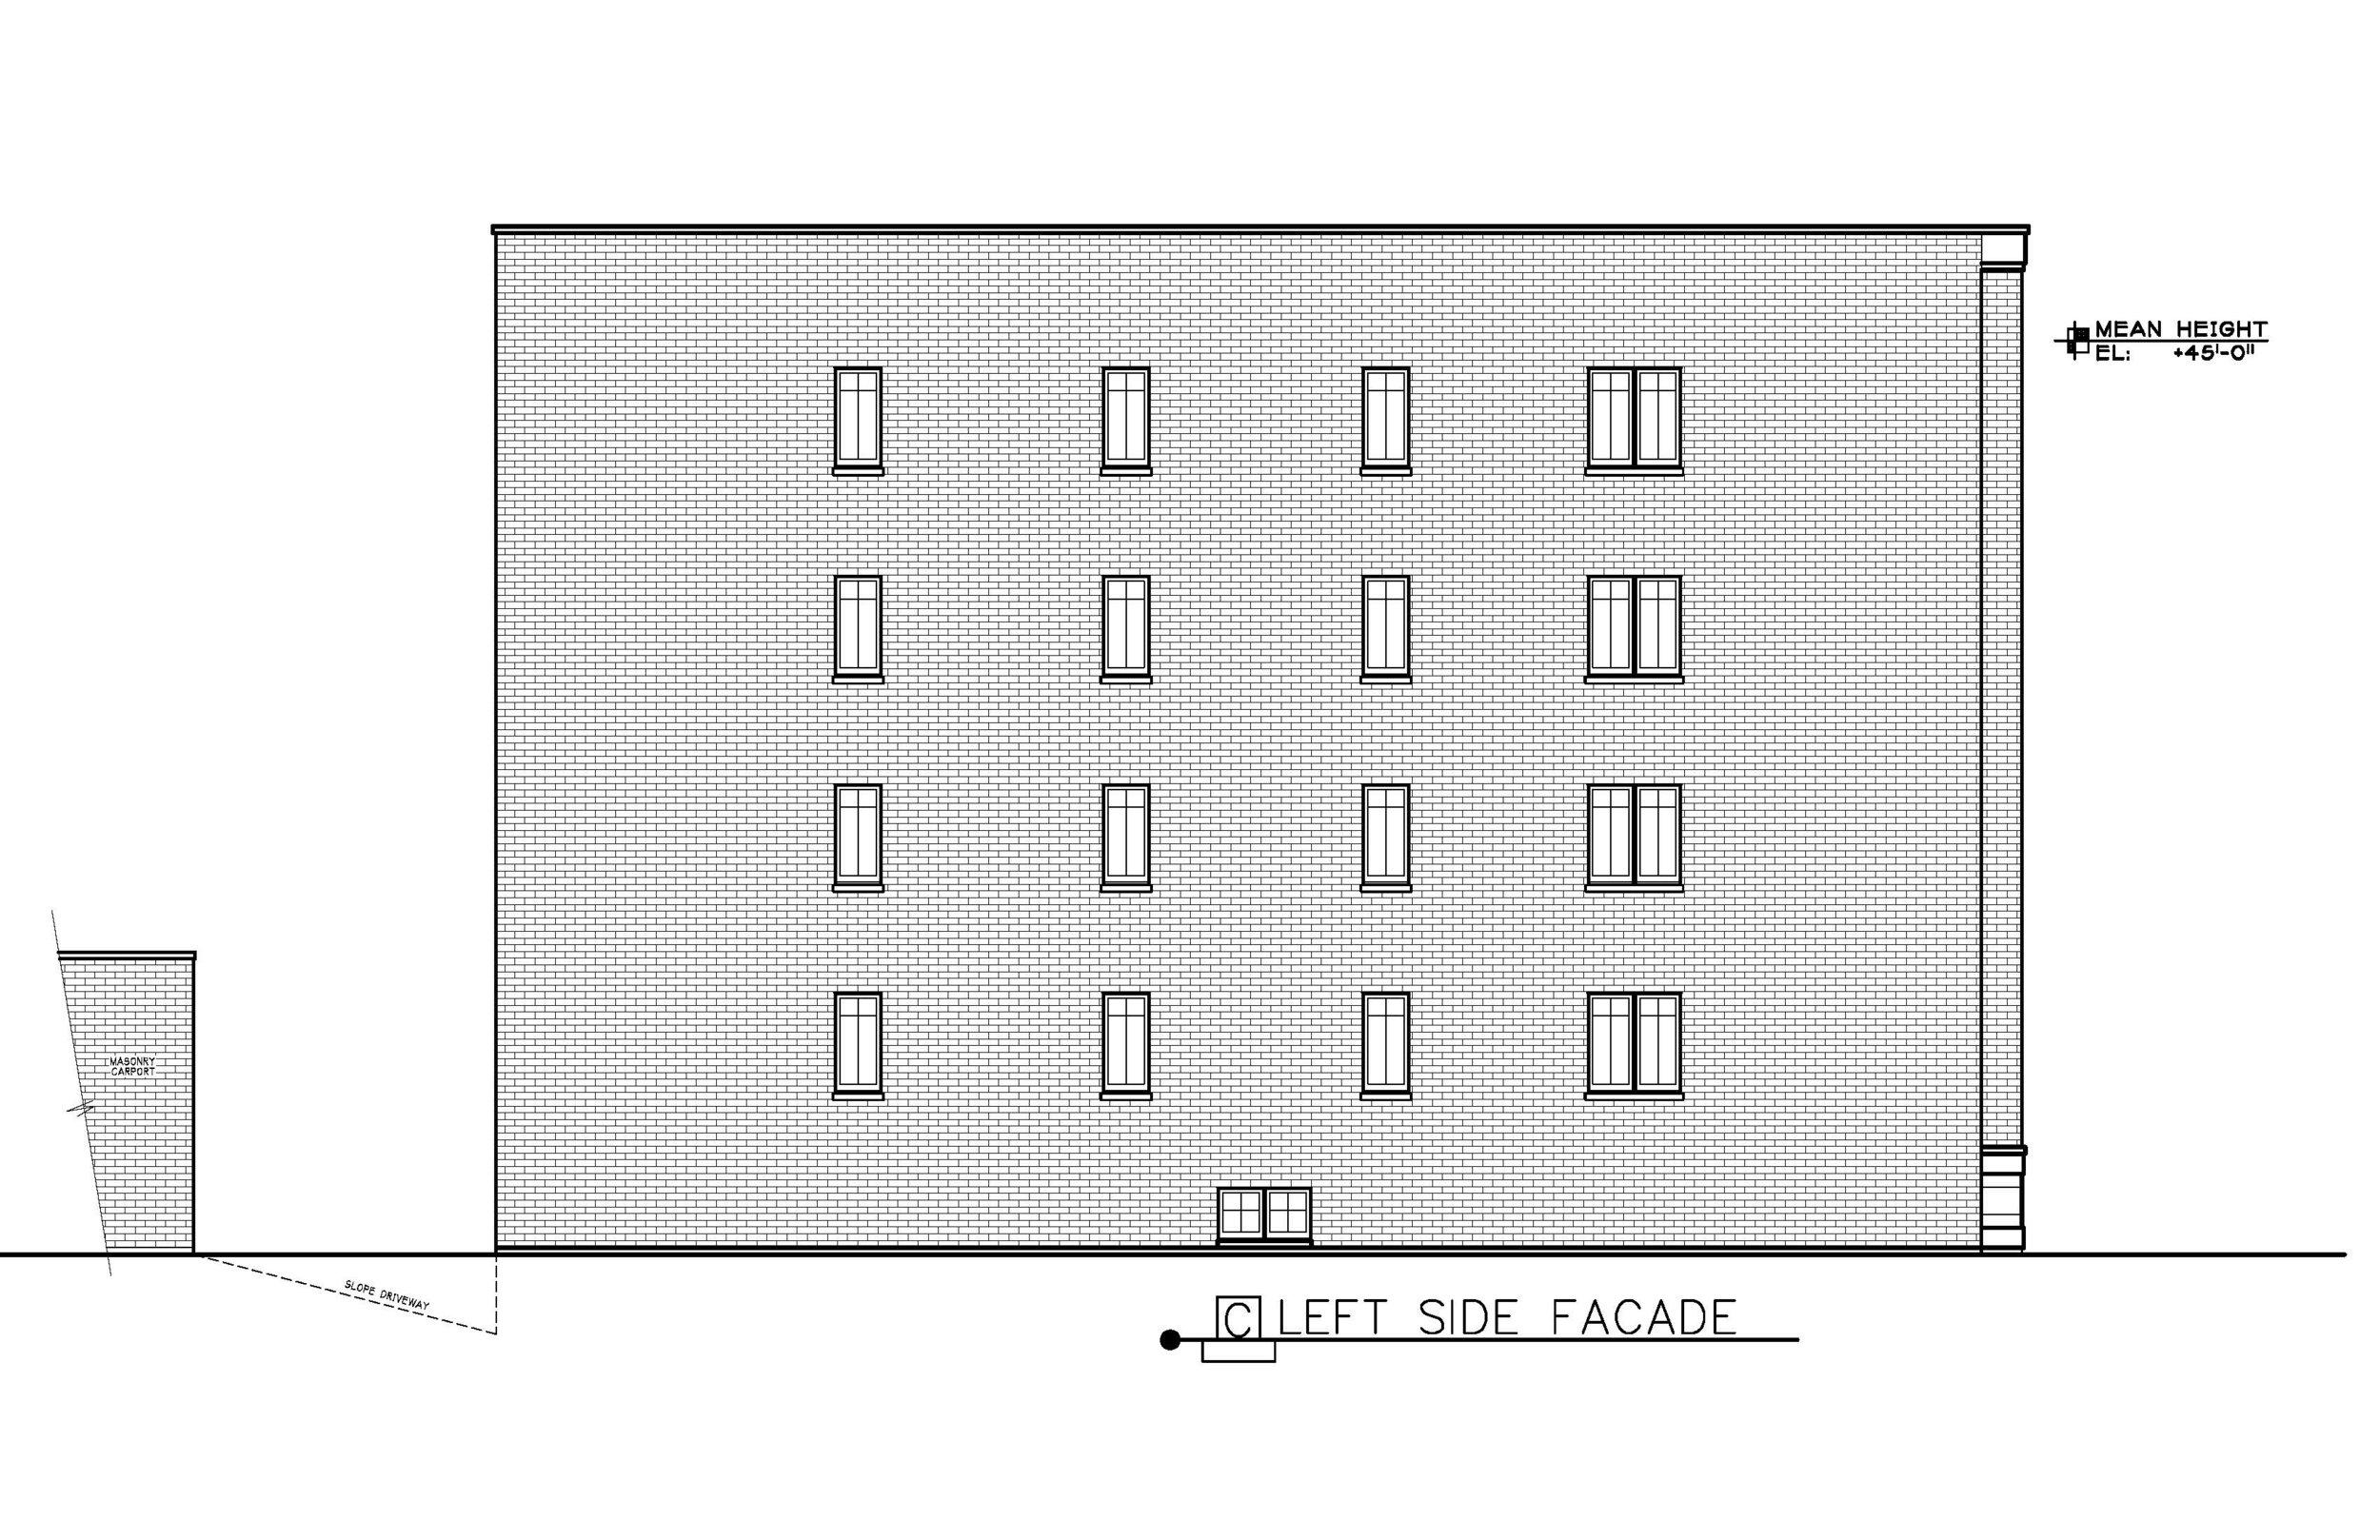 1600 W Hollywood Floor Plan 9.jpg